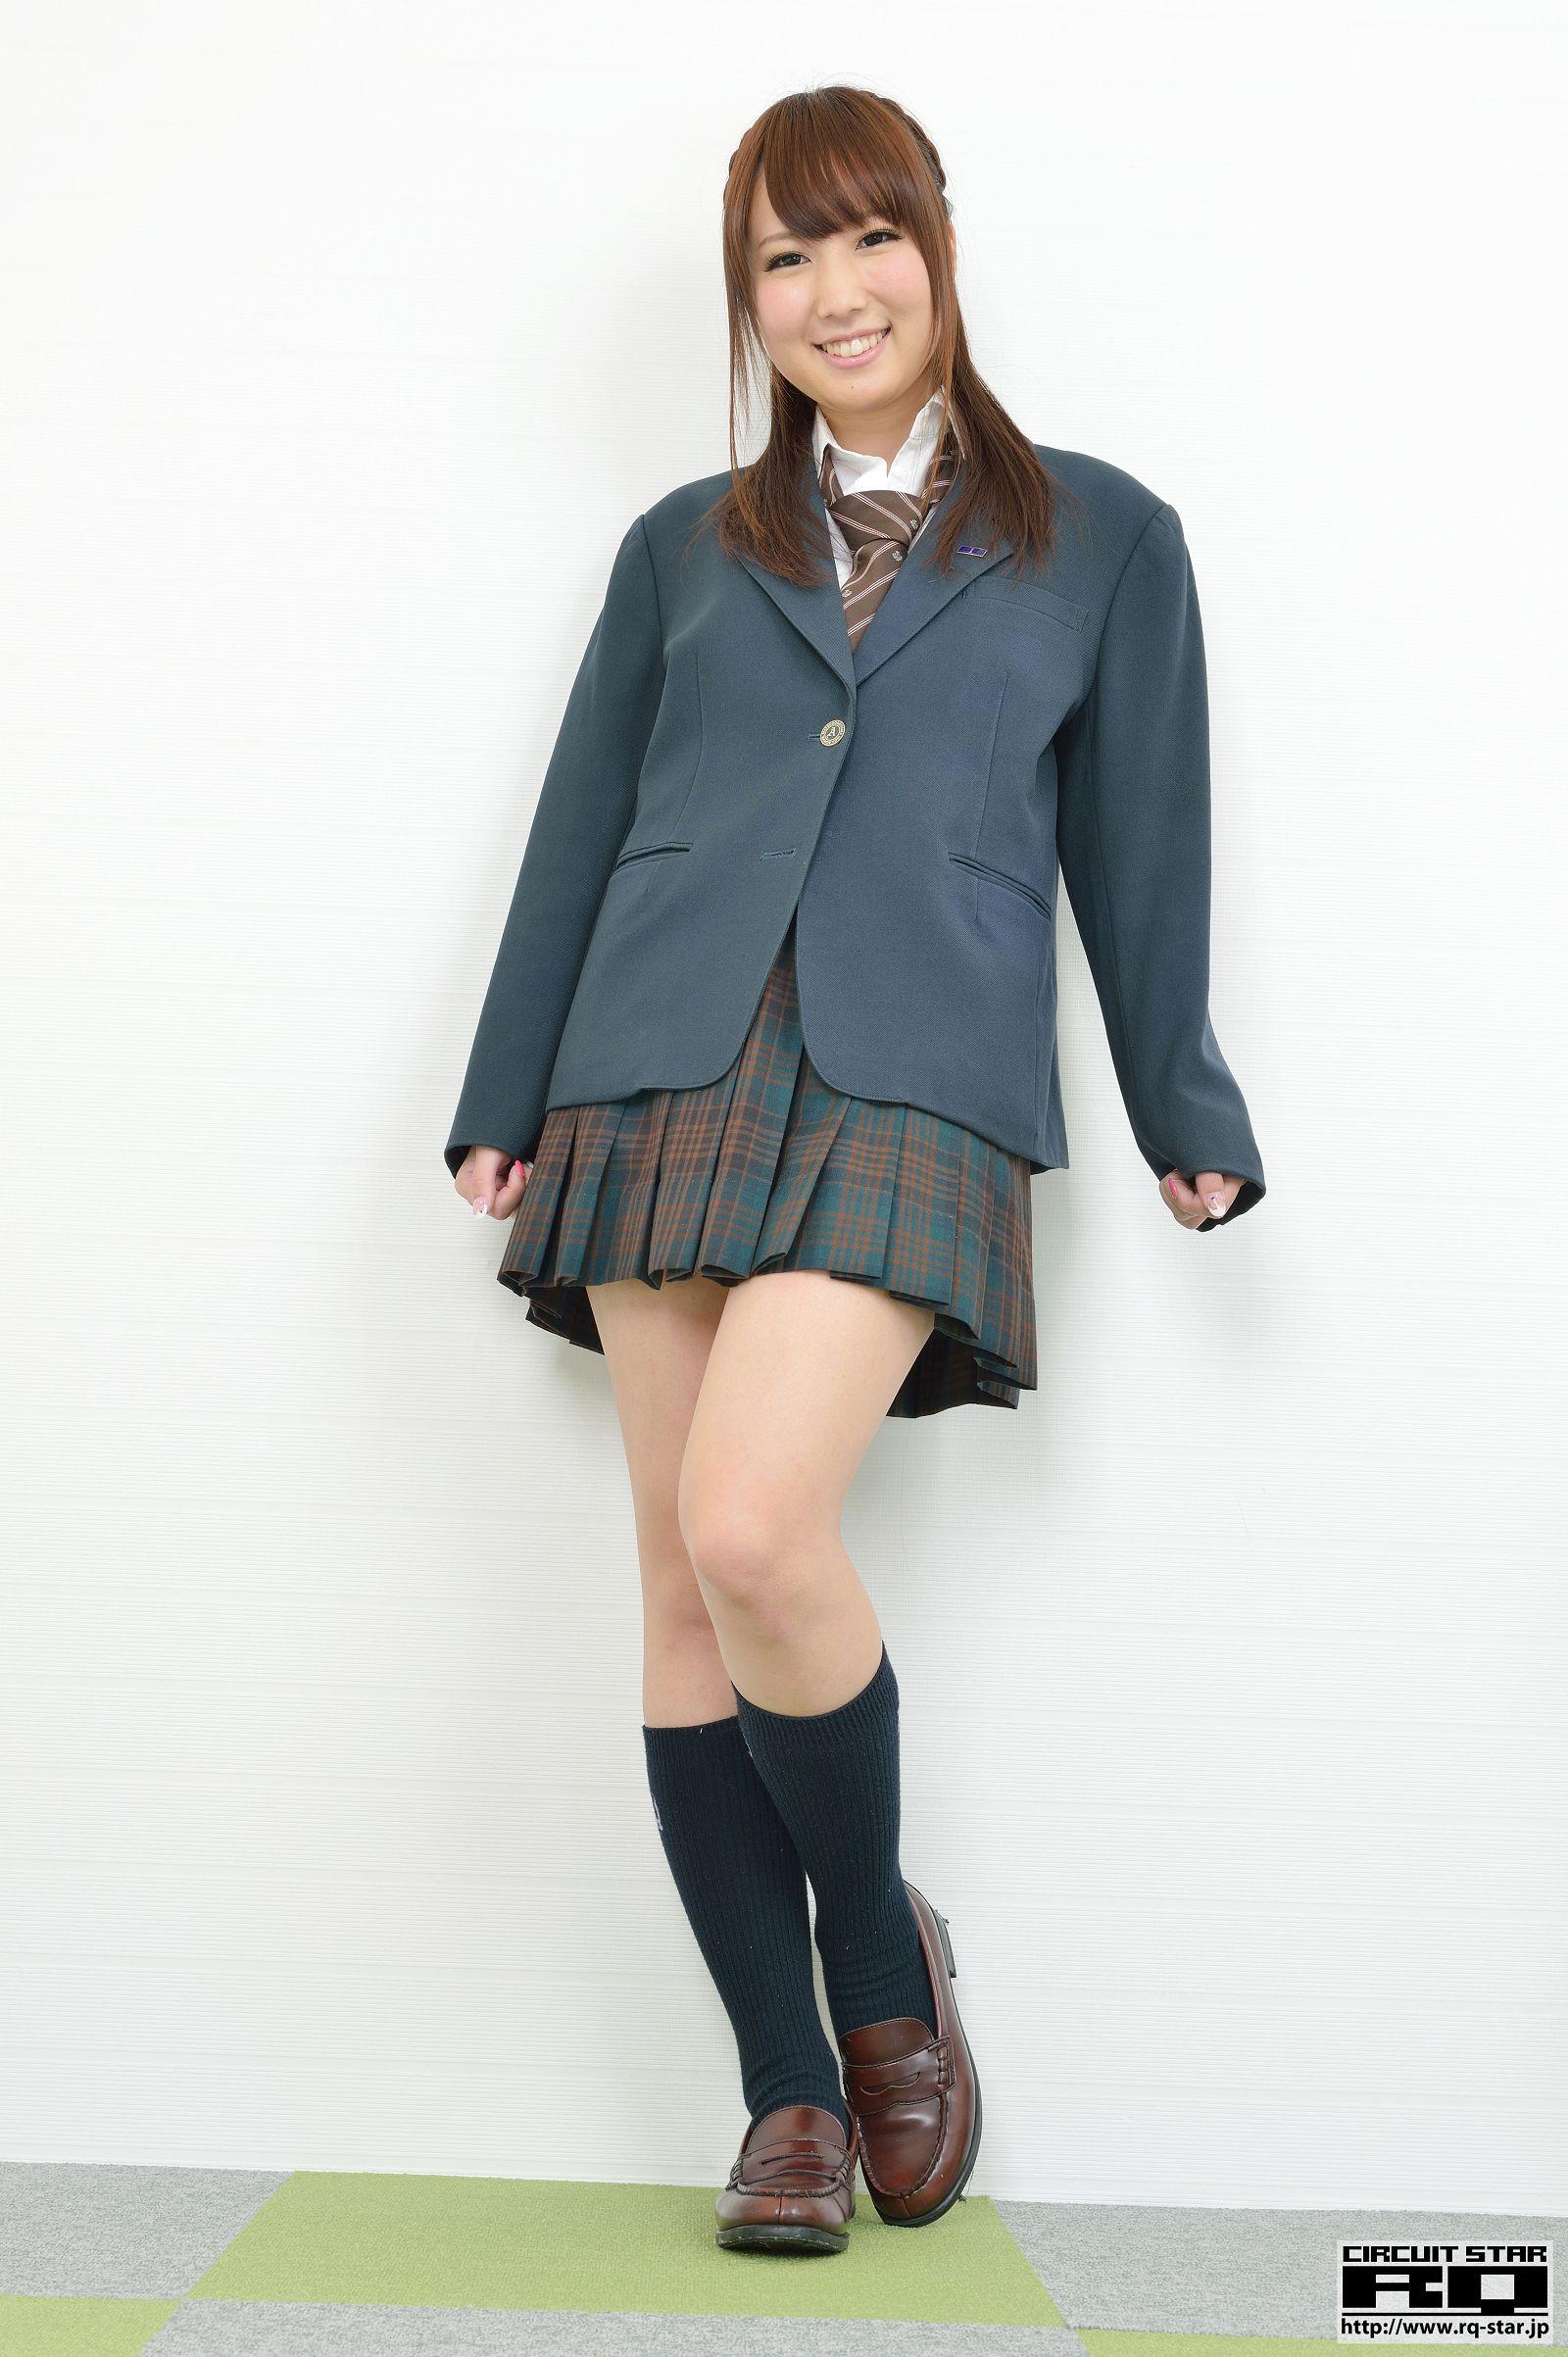 [RQ STAR美女] NO.00989 Nanami Takahashi 高橋七海 School Girl[90P] RQ STAR 第1张